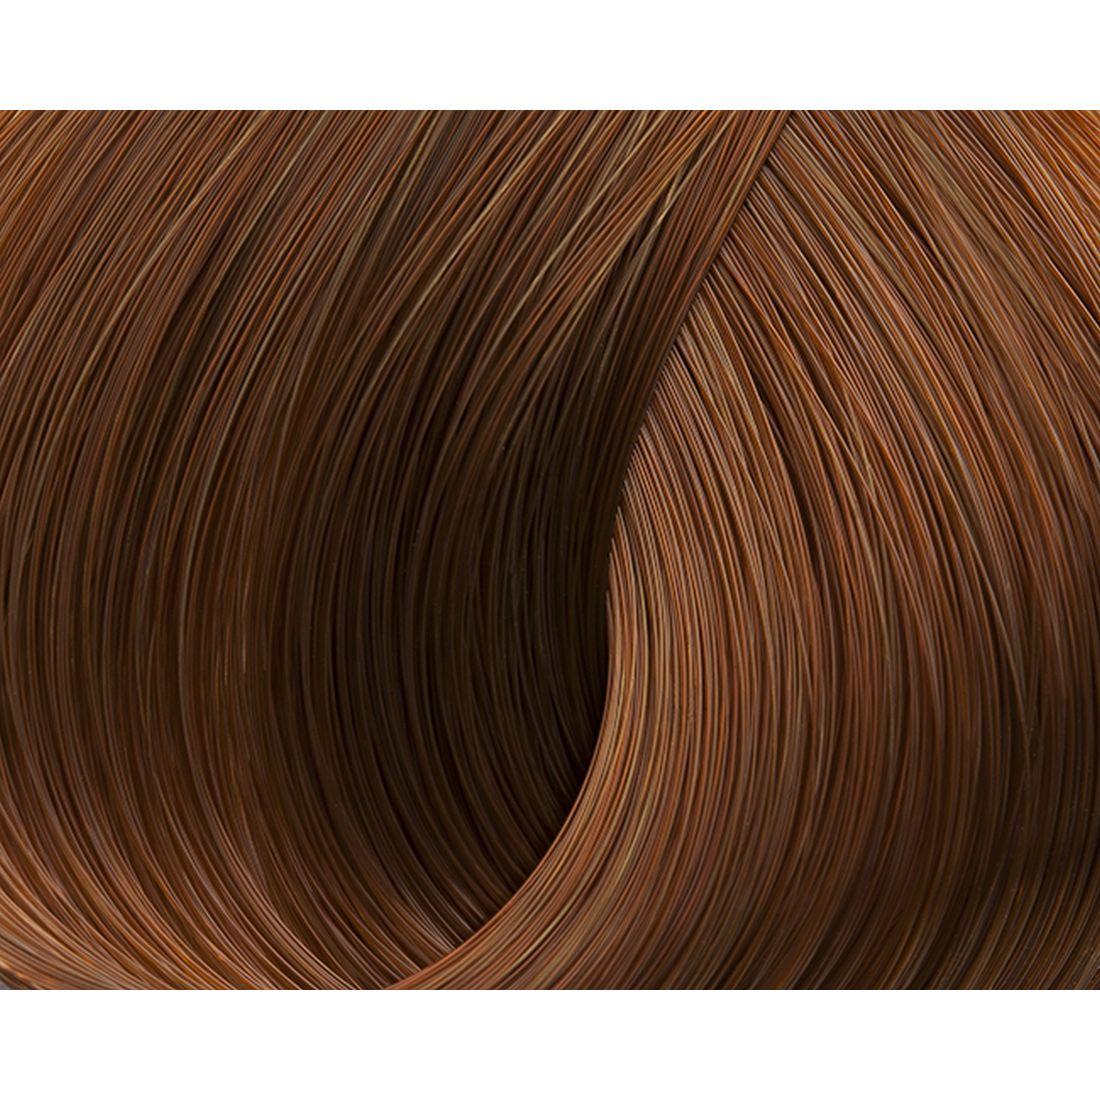 Lorvenn Beauty Color Επαγγελματική Βαφή Σωληνάριο 70ml No 7.44 Ξανθό Χάλκινο Βαθύ No 7.44 Ξανθό Χάλκινο Βαθύ